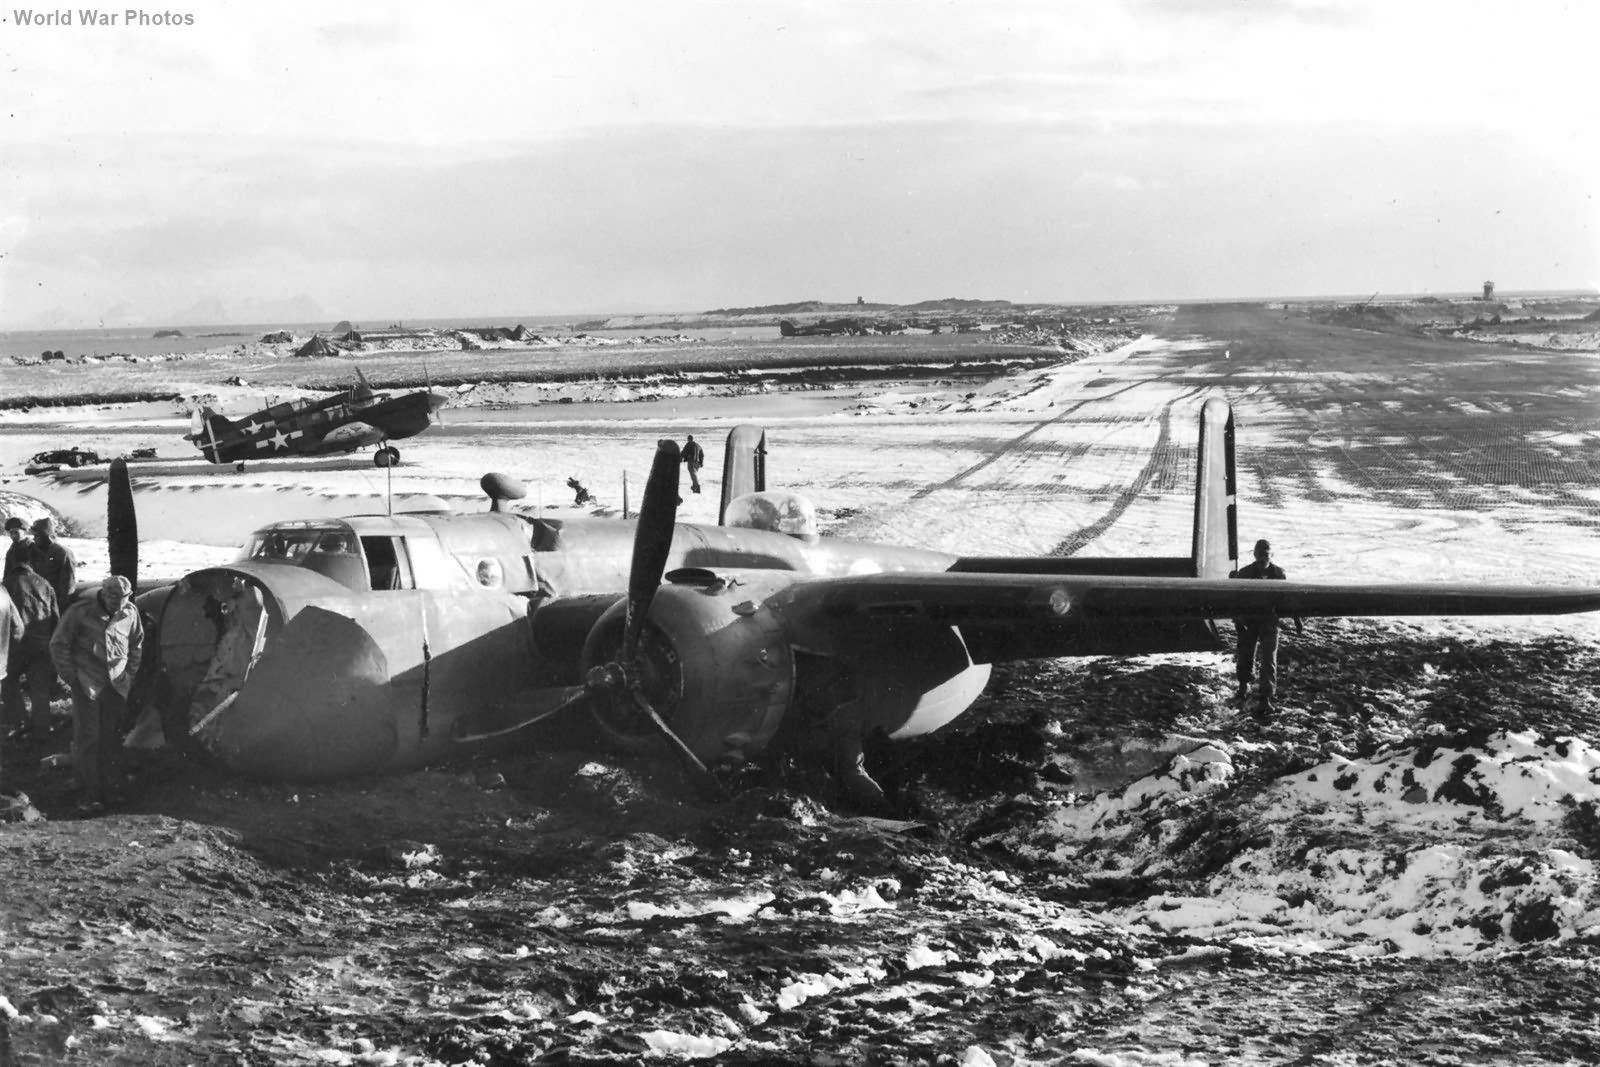 Crash B-25 of the 28th Bomb Squadron on Attu 13 November 1943